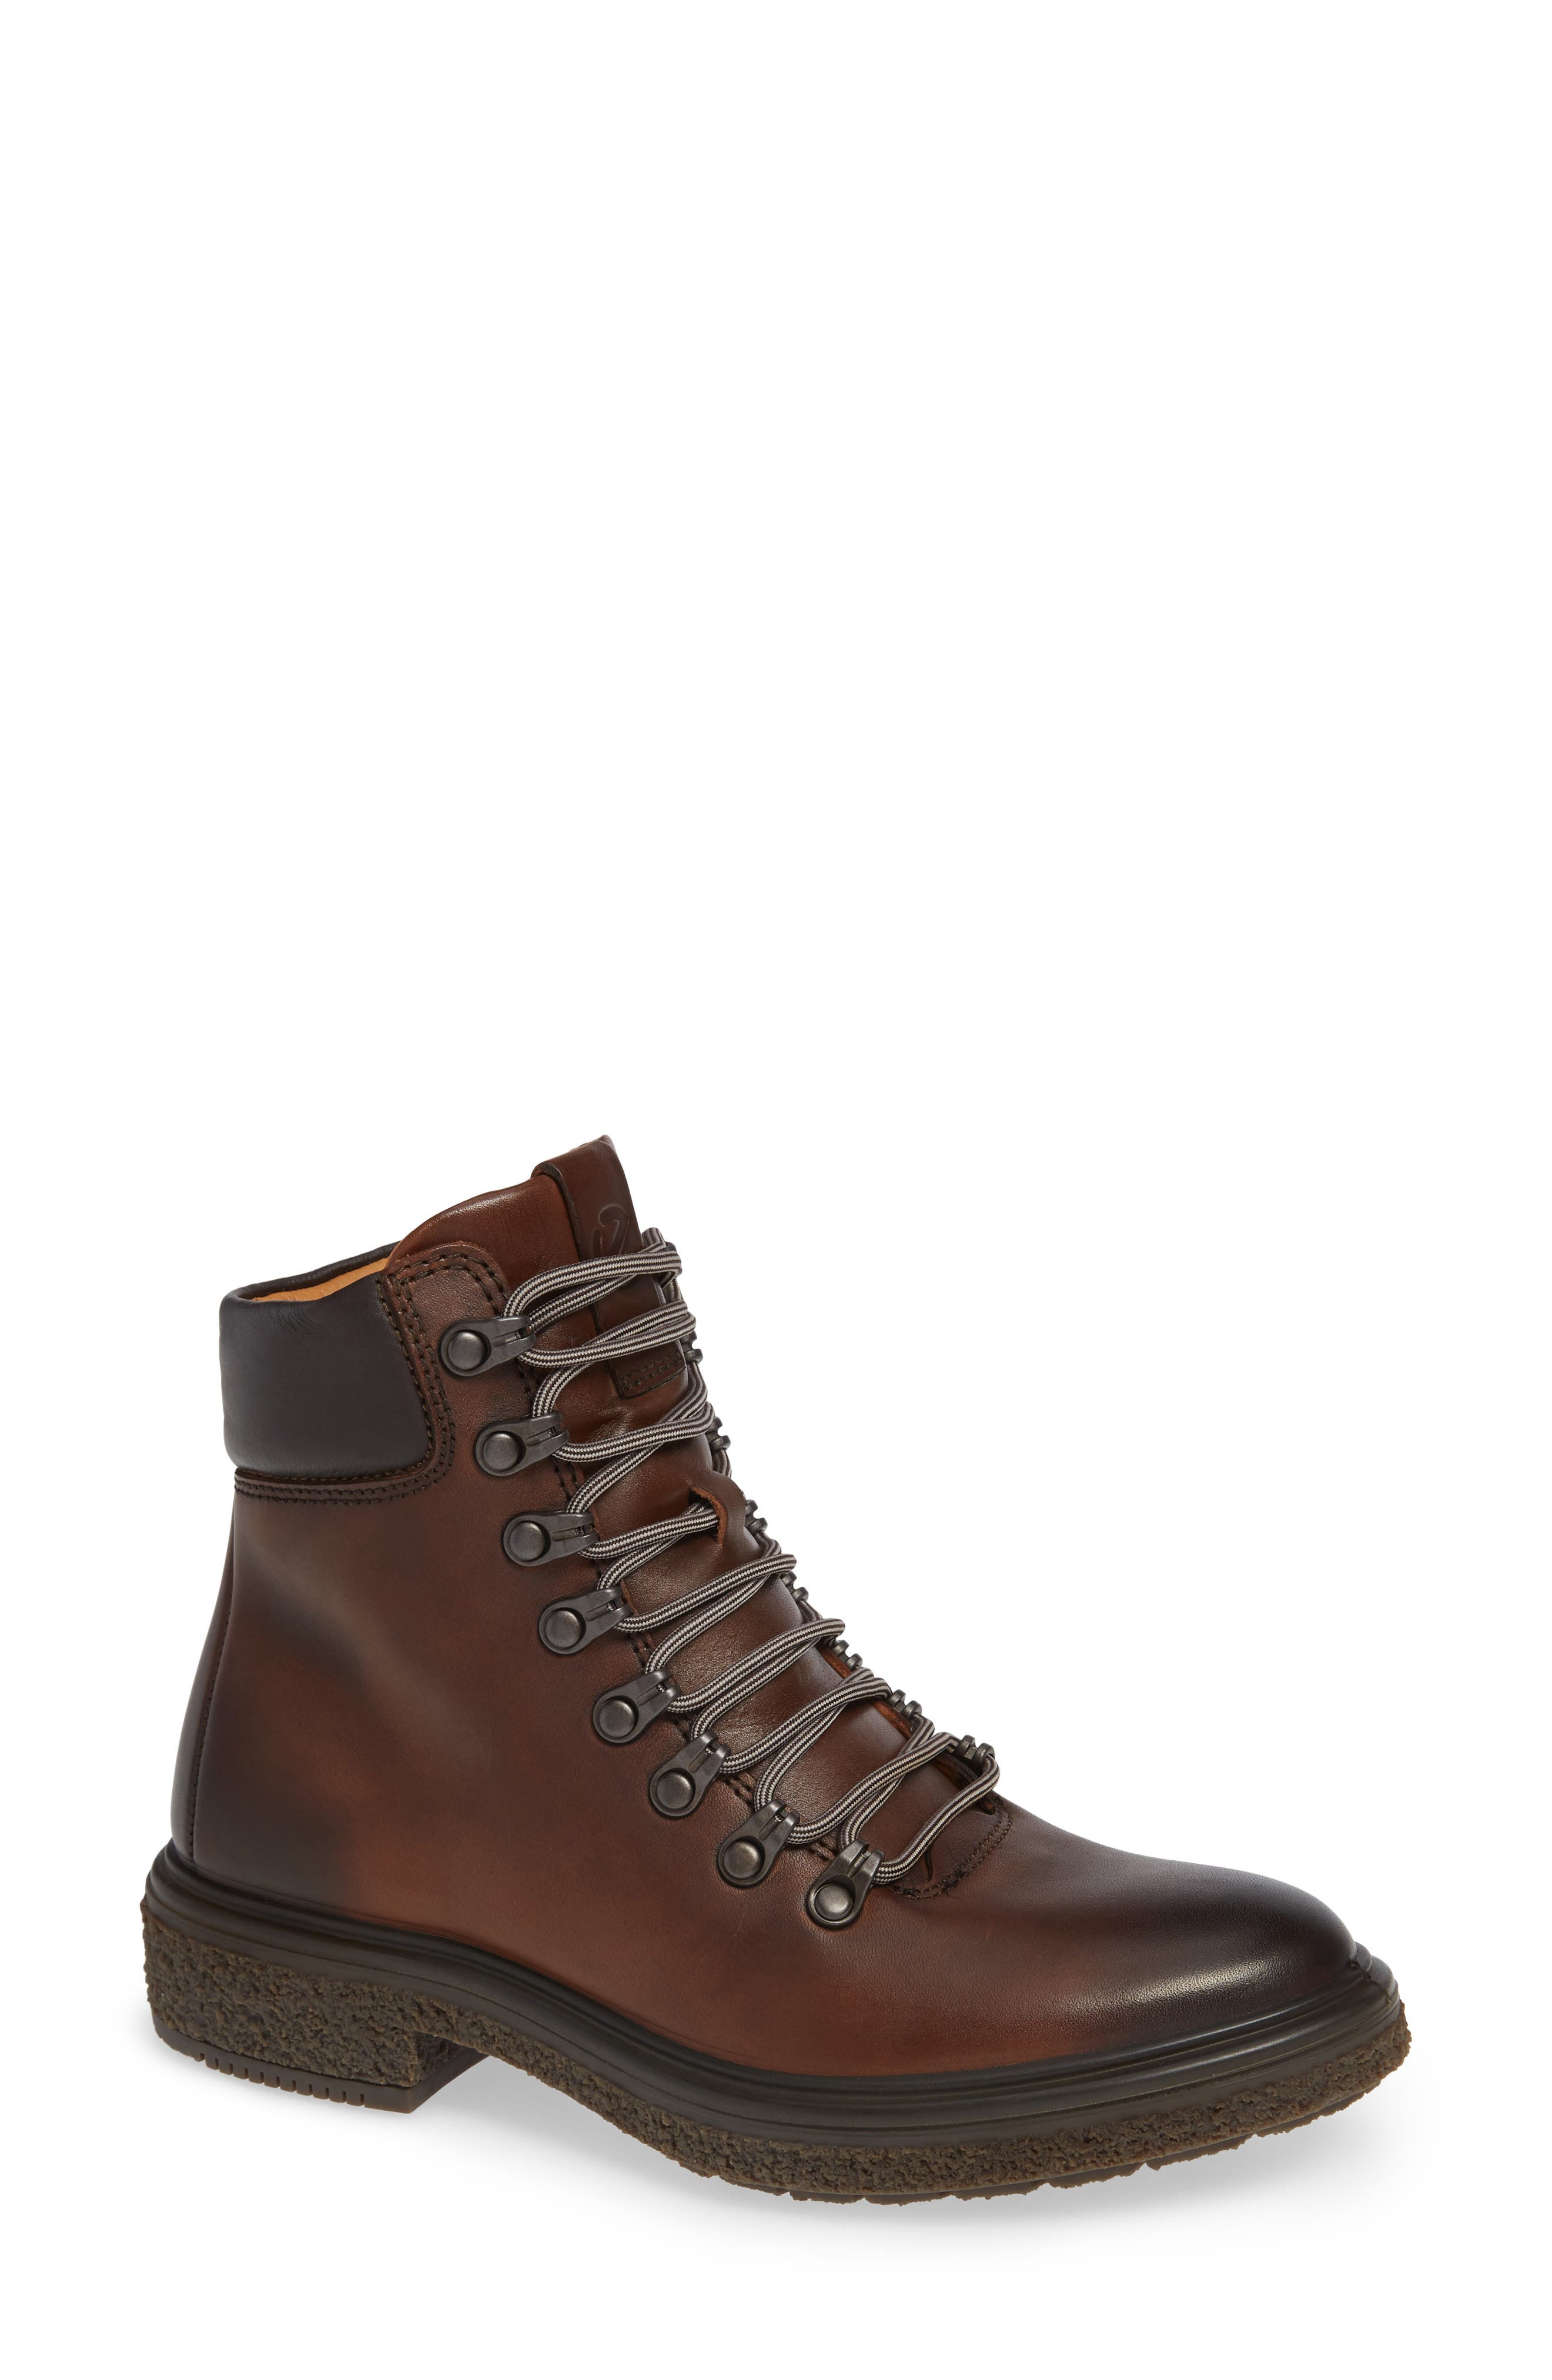 Ecco Crepetray Boot,12.5 - Brown